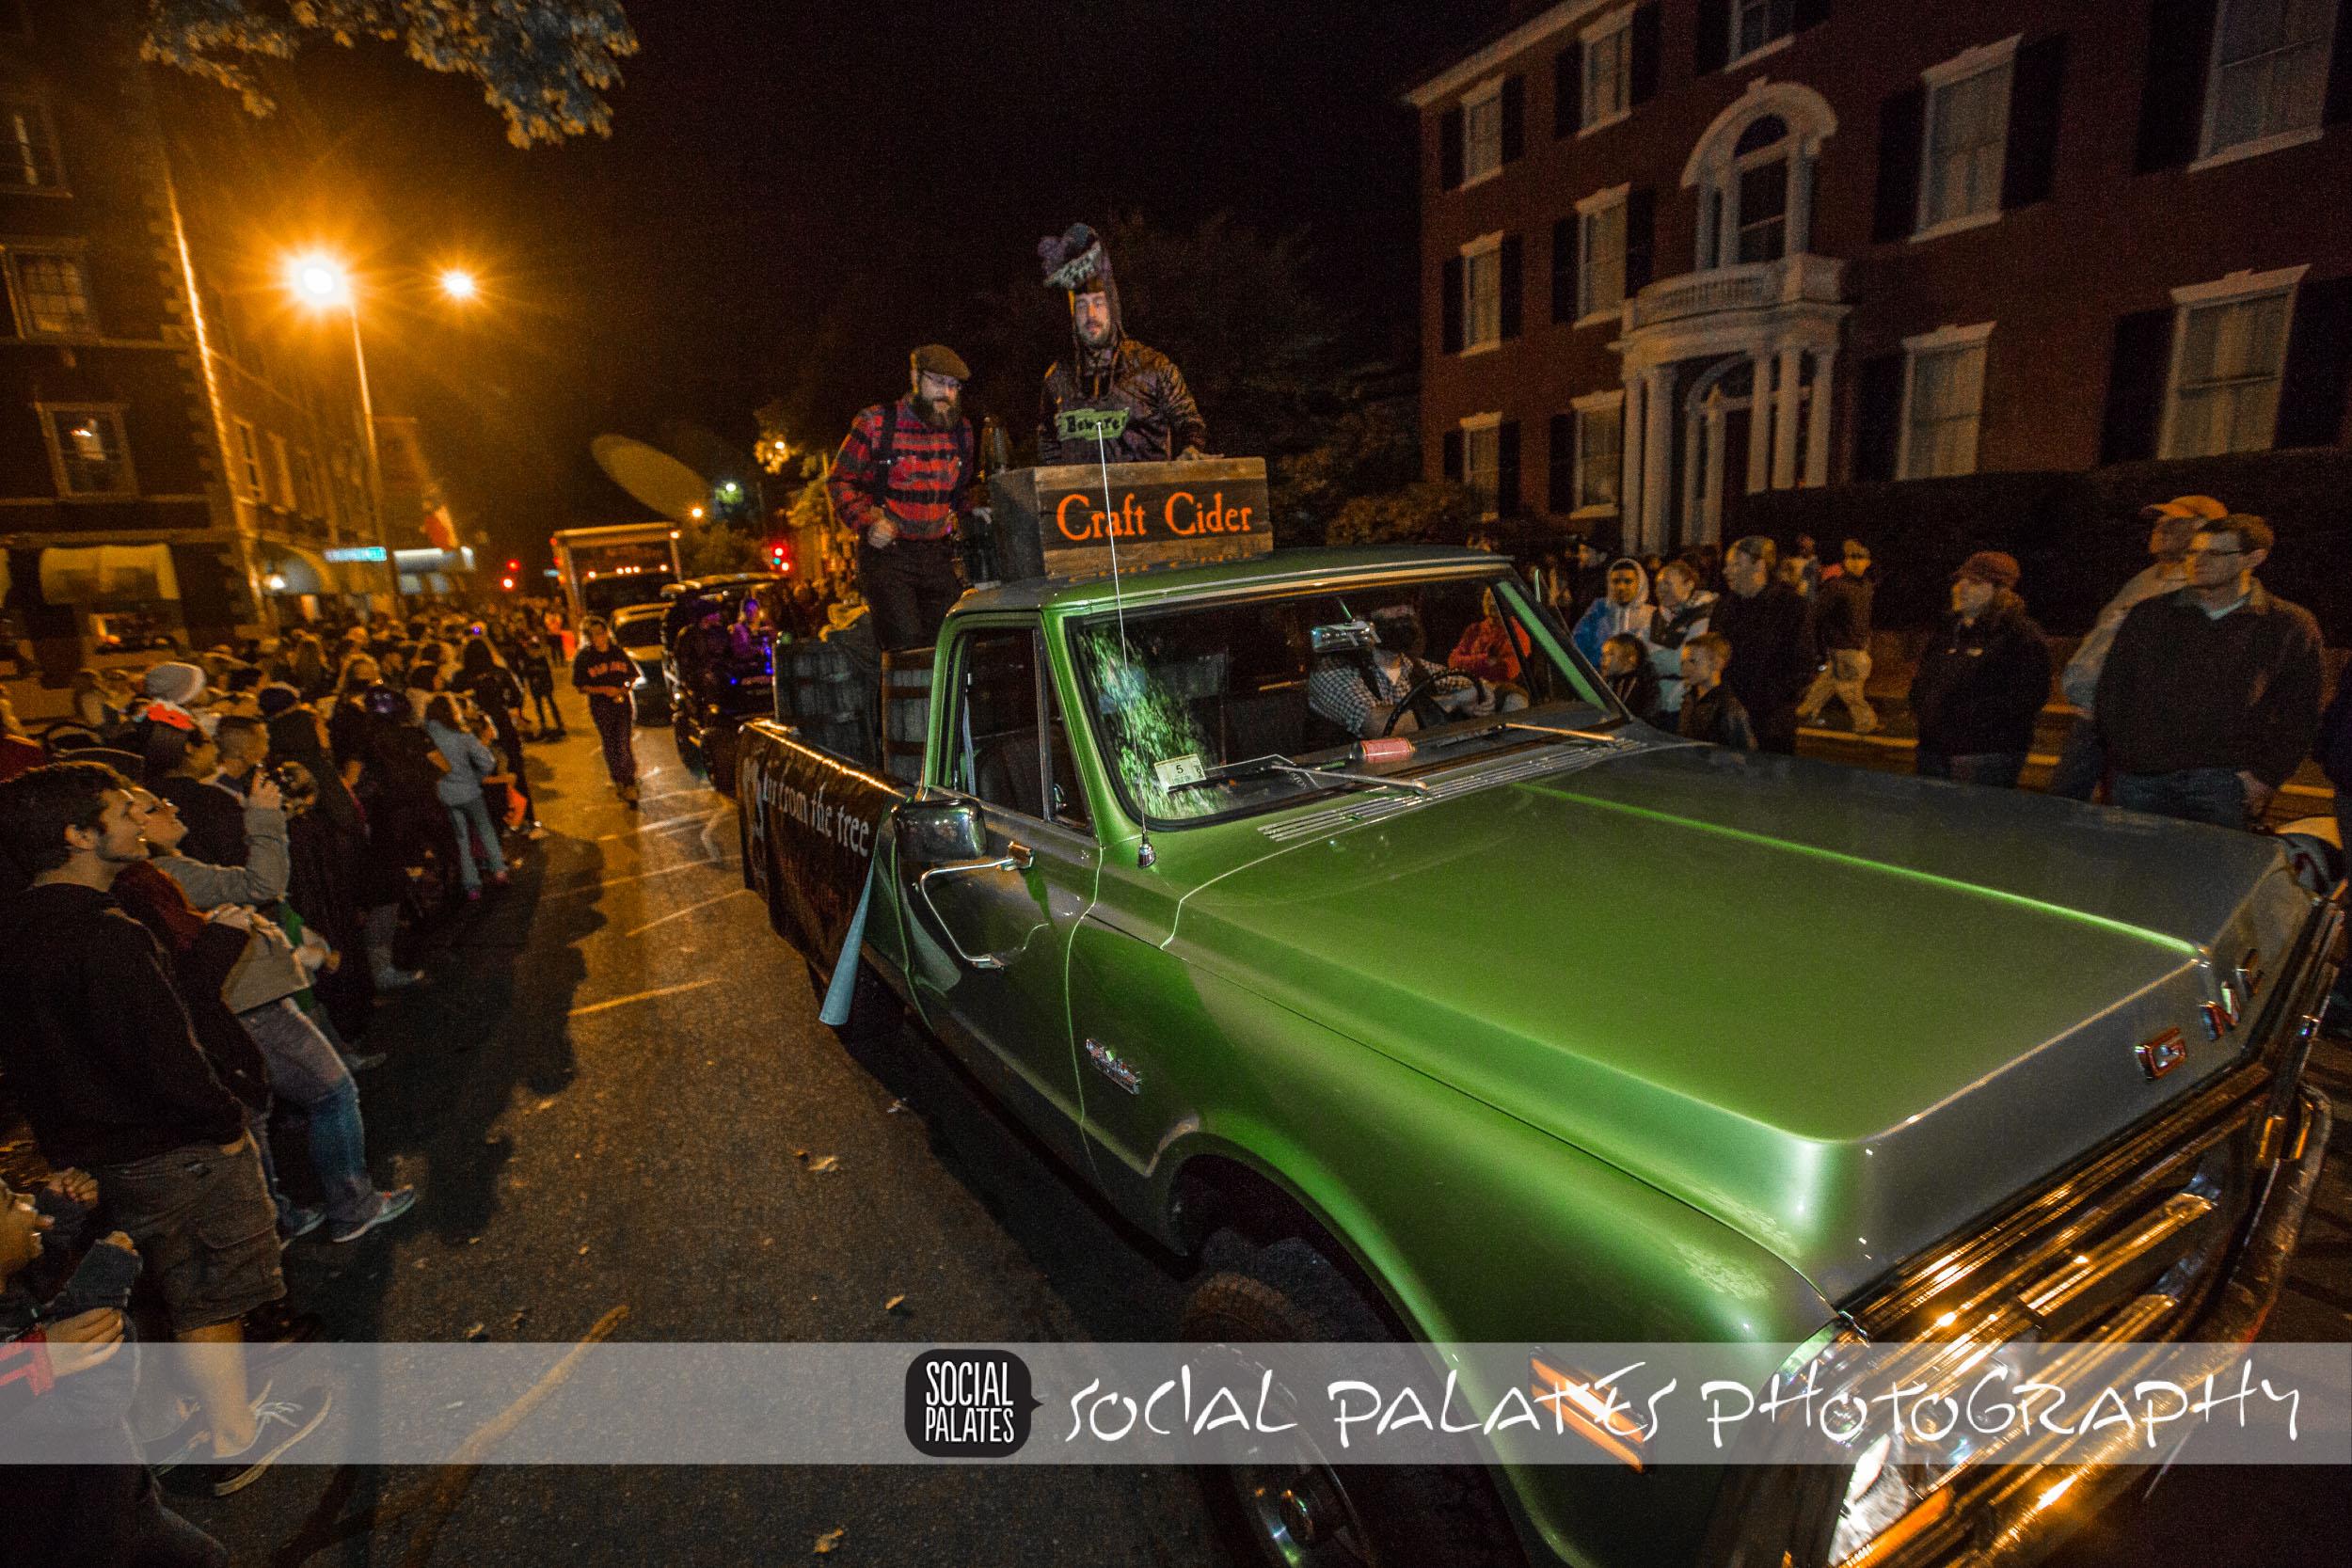 Haunted Happenings Parade 2014 Creative Salem by Social Palates-7904.jpg